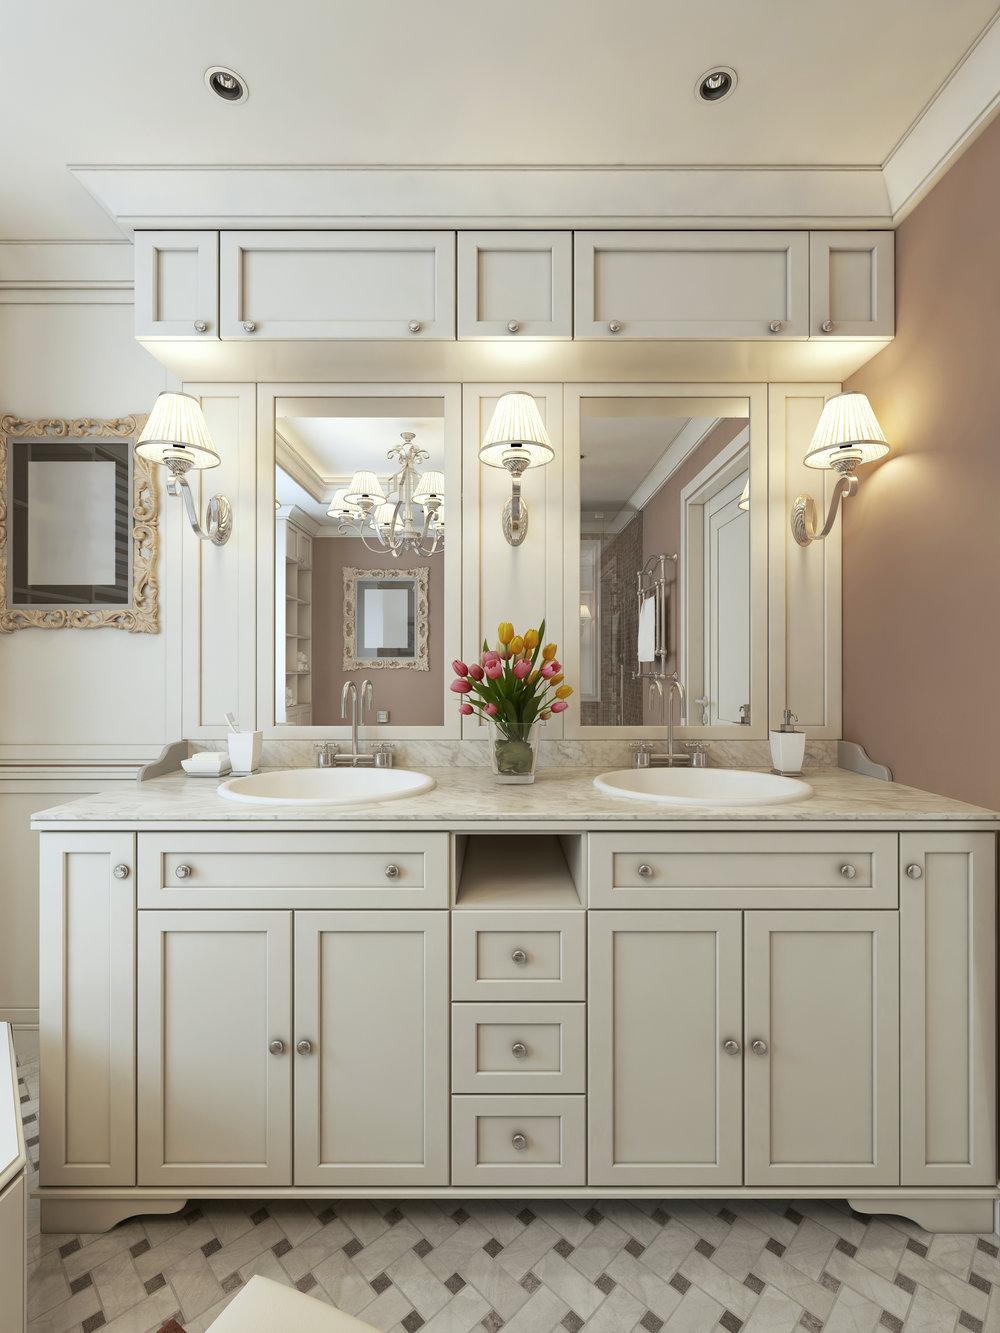 City Home Center Bathrooms